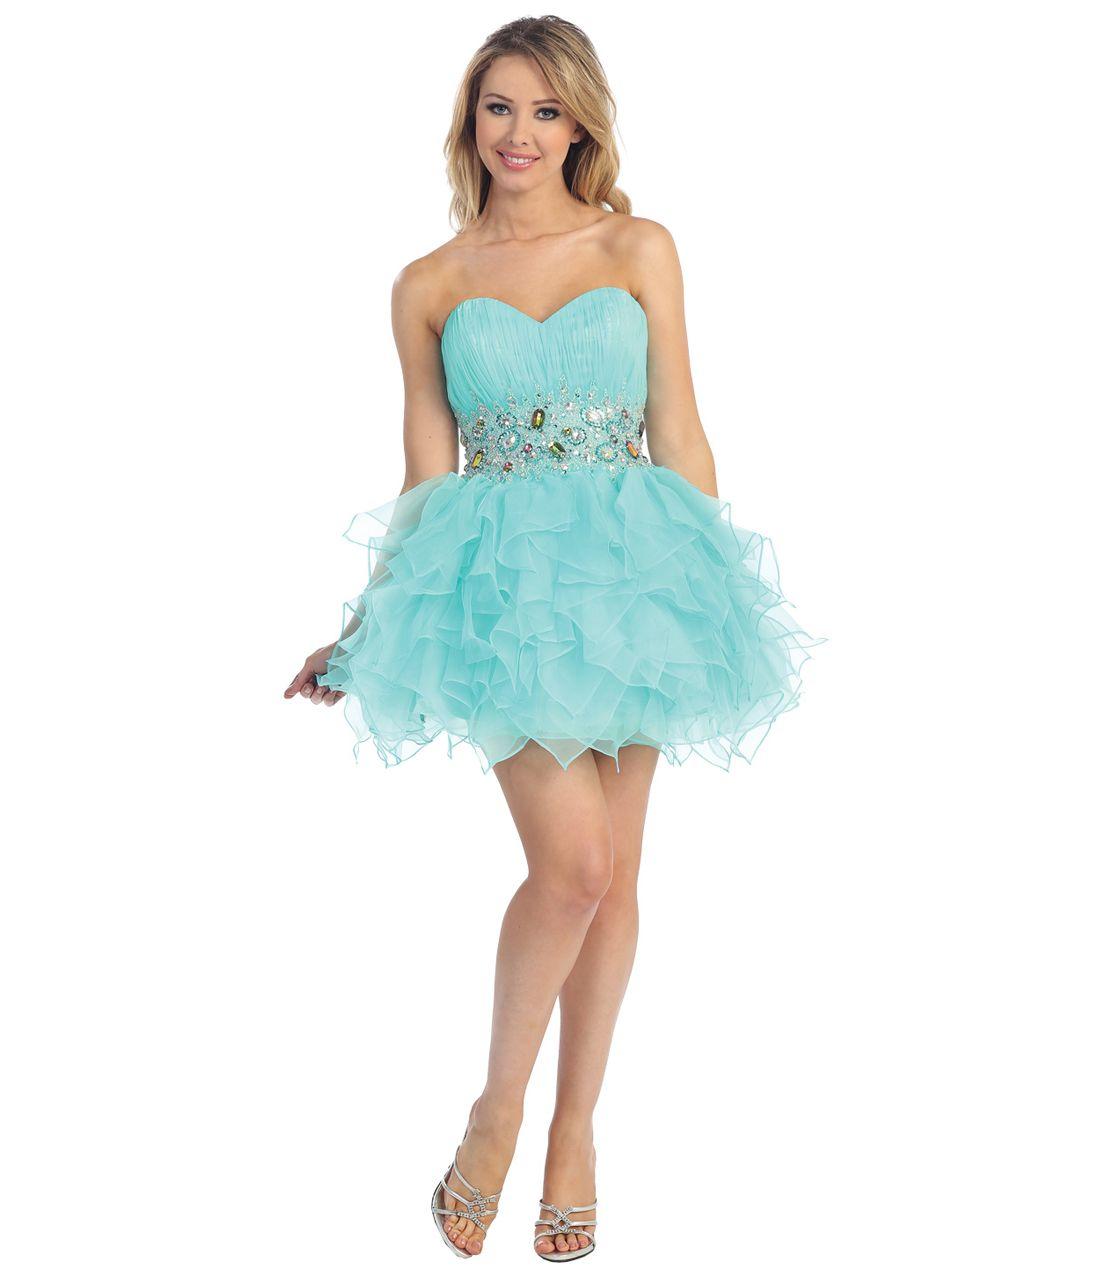 Unique Vintage | Short prom dresses, Short prom and Prom